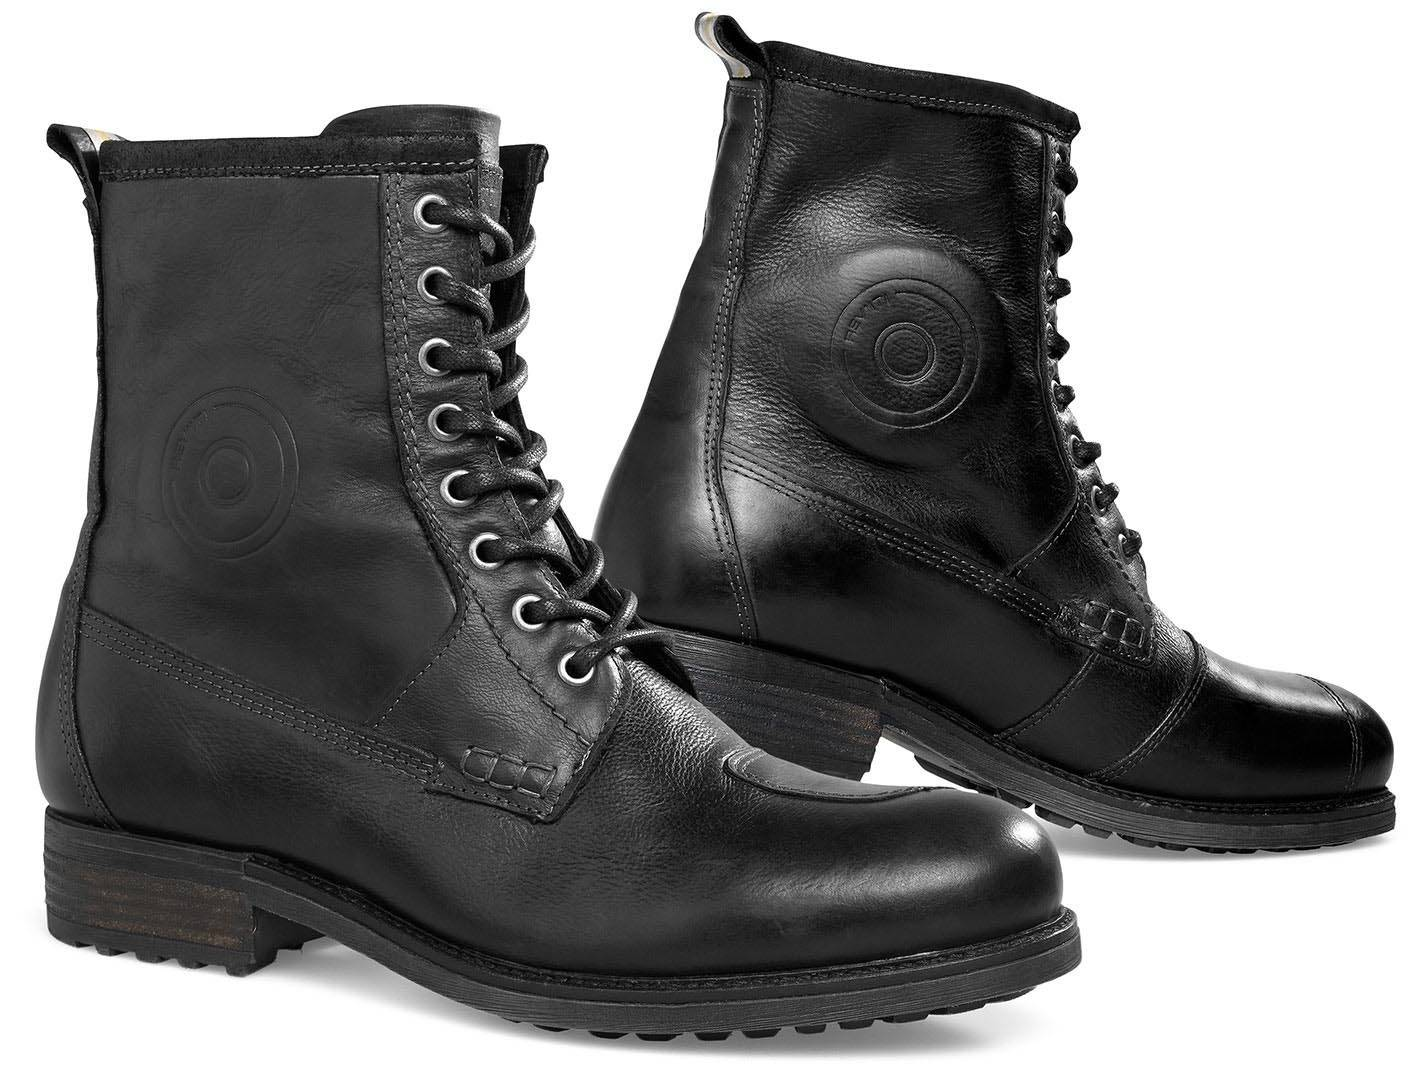 Revit Rodeo Boots Black 45